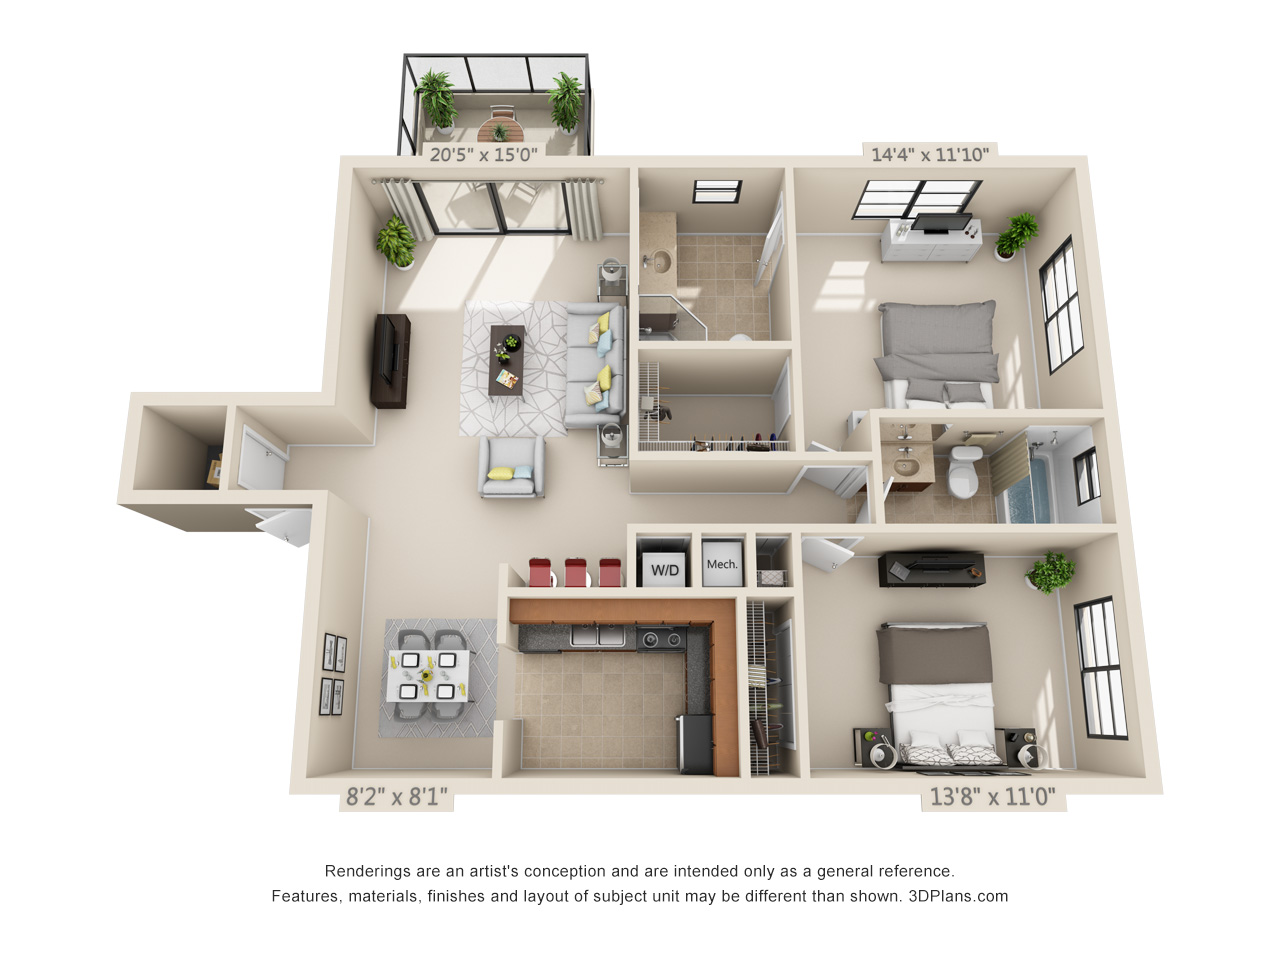 boca raton apartments in south florida